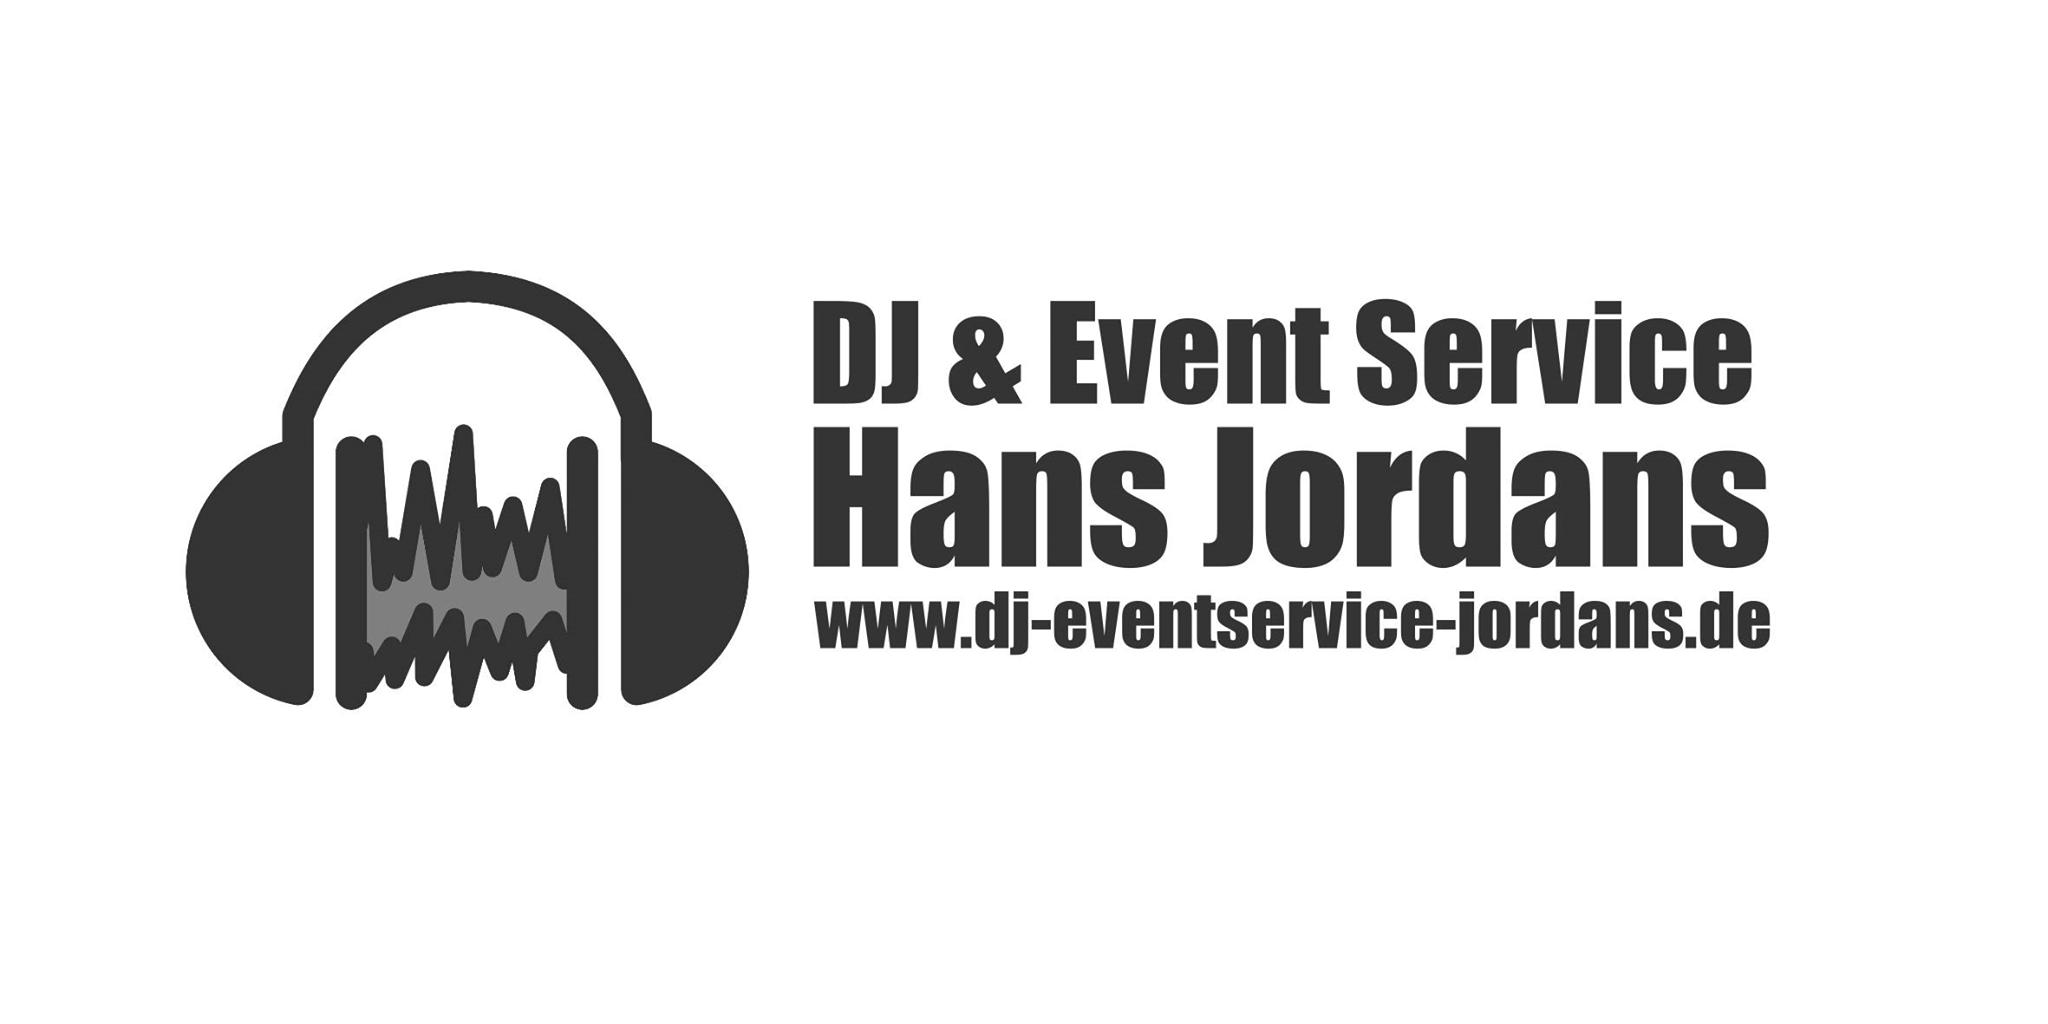 DJ & Event Service Hans Jordans